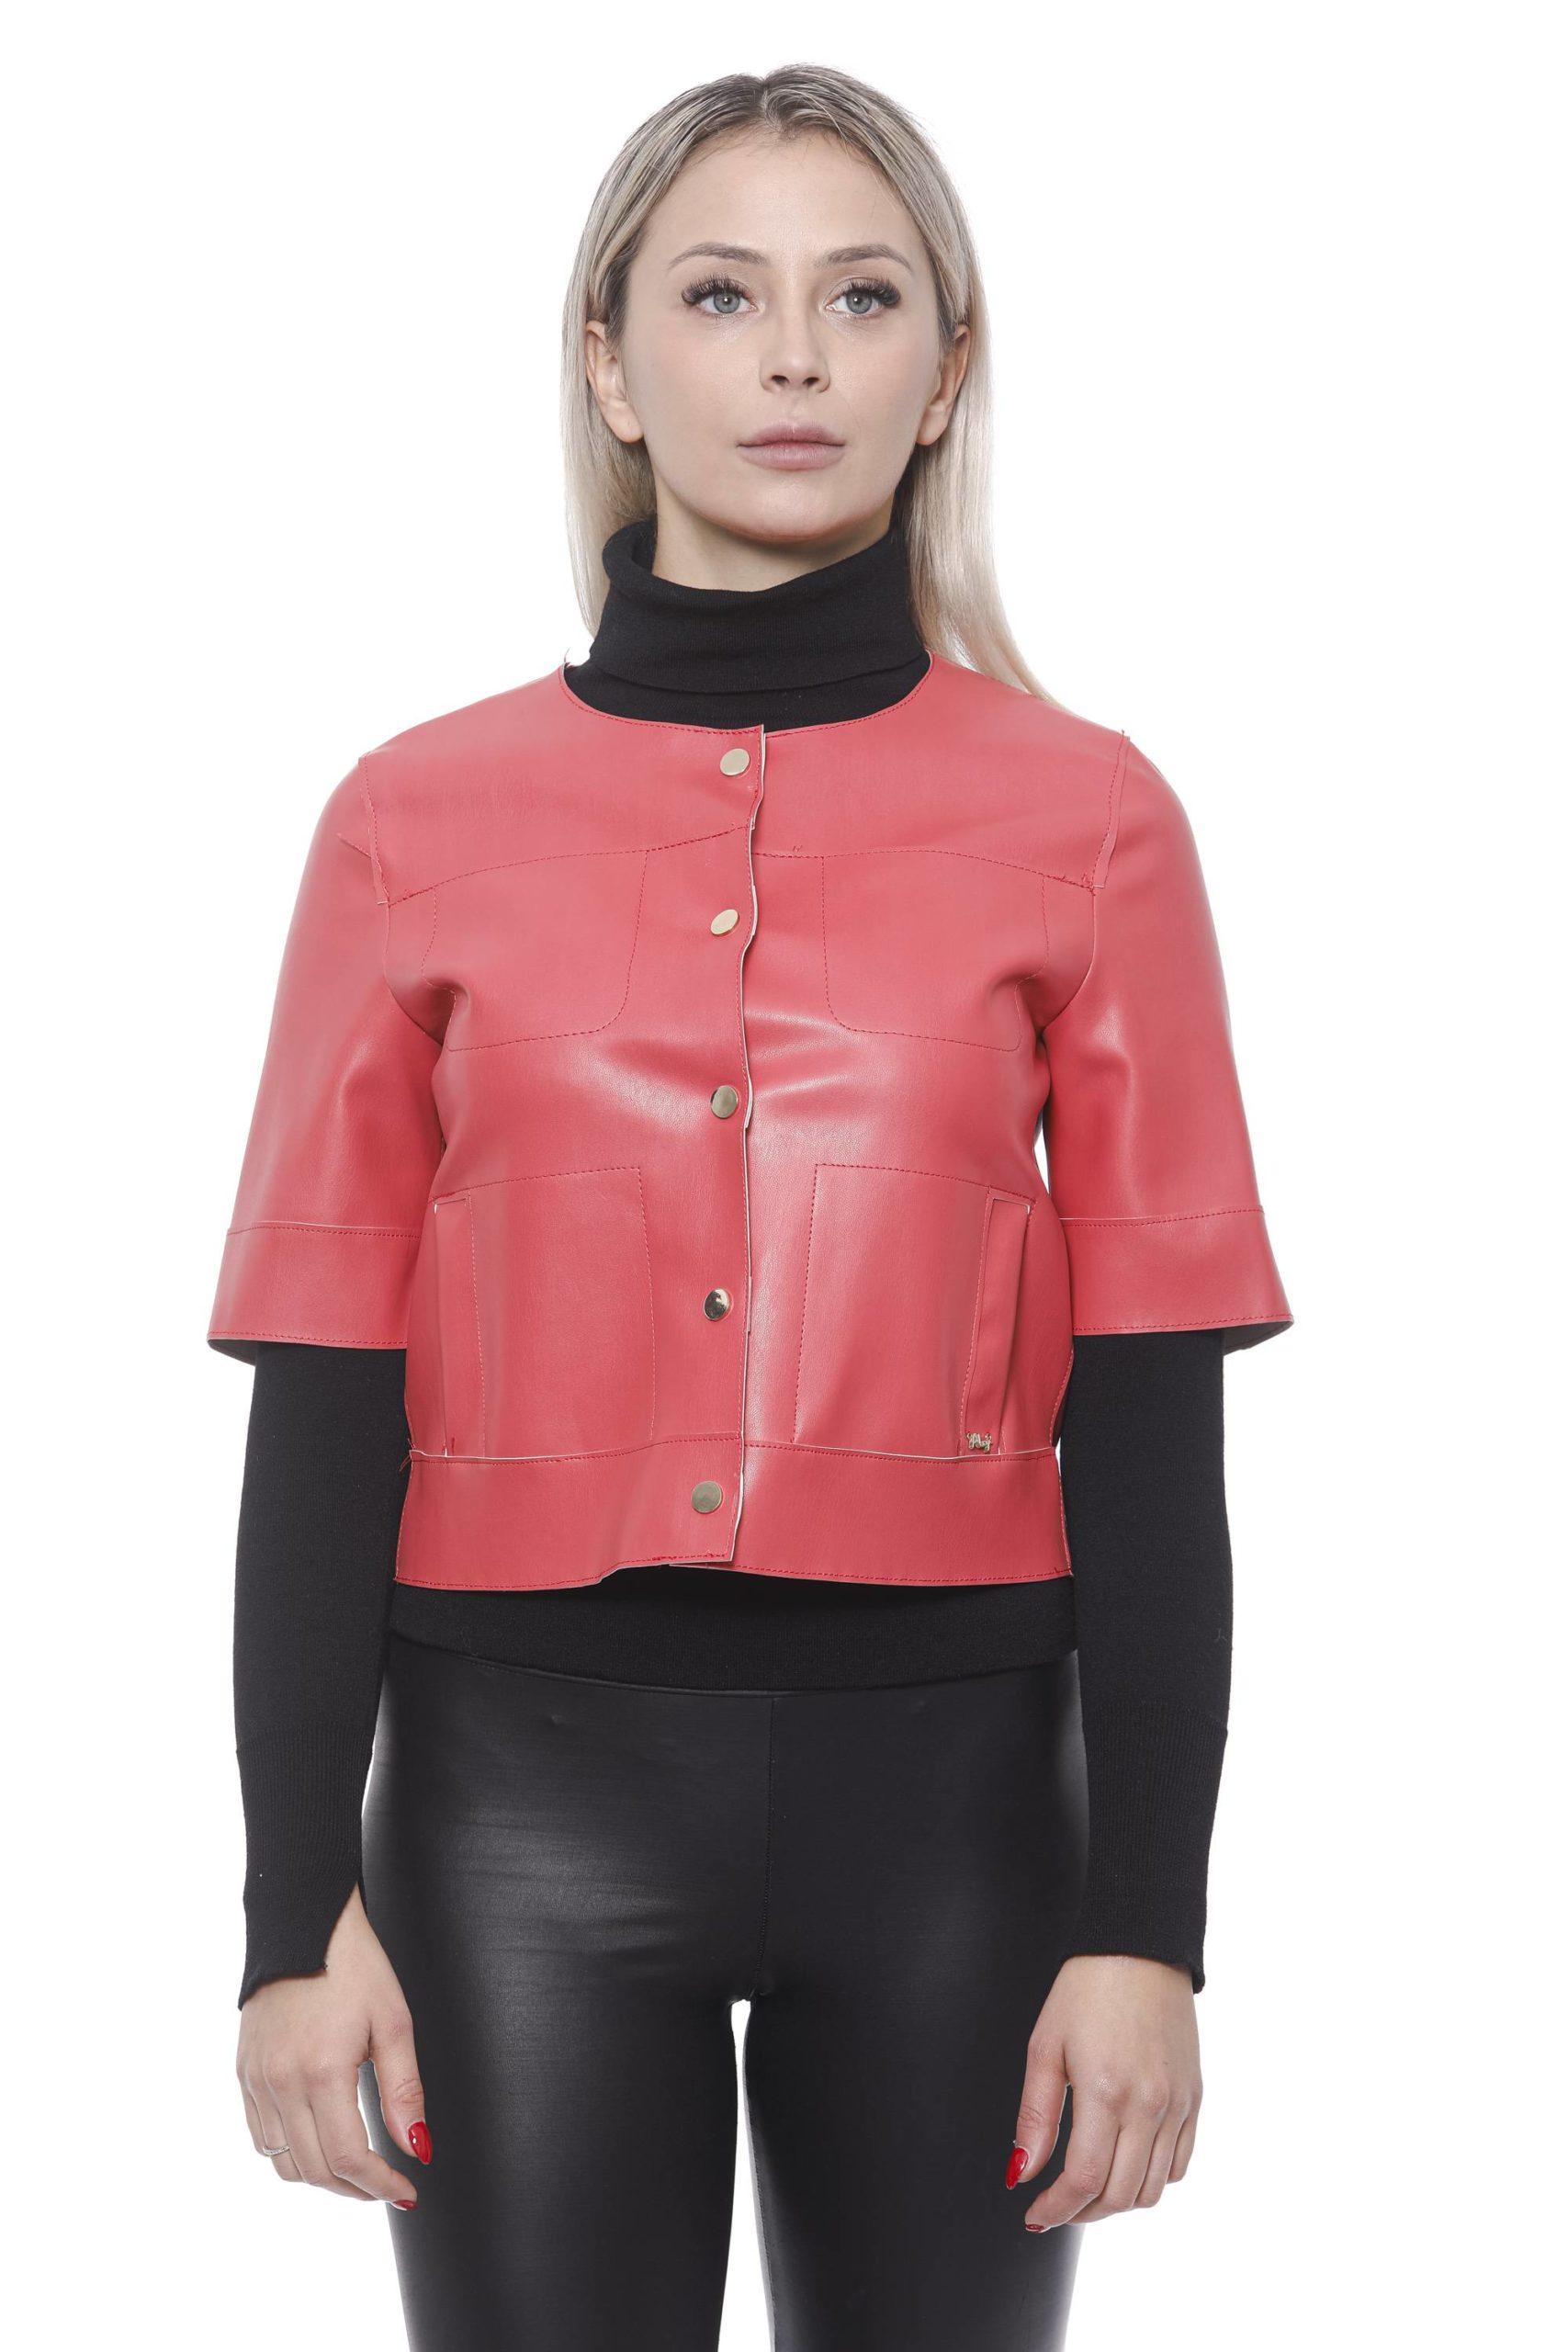 19V69 Italia Women's Rosa Jacket Pink 191388448 - M